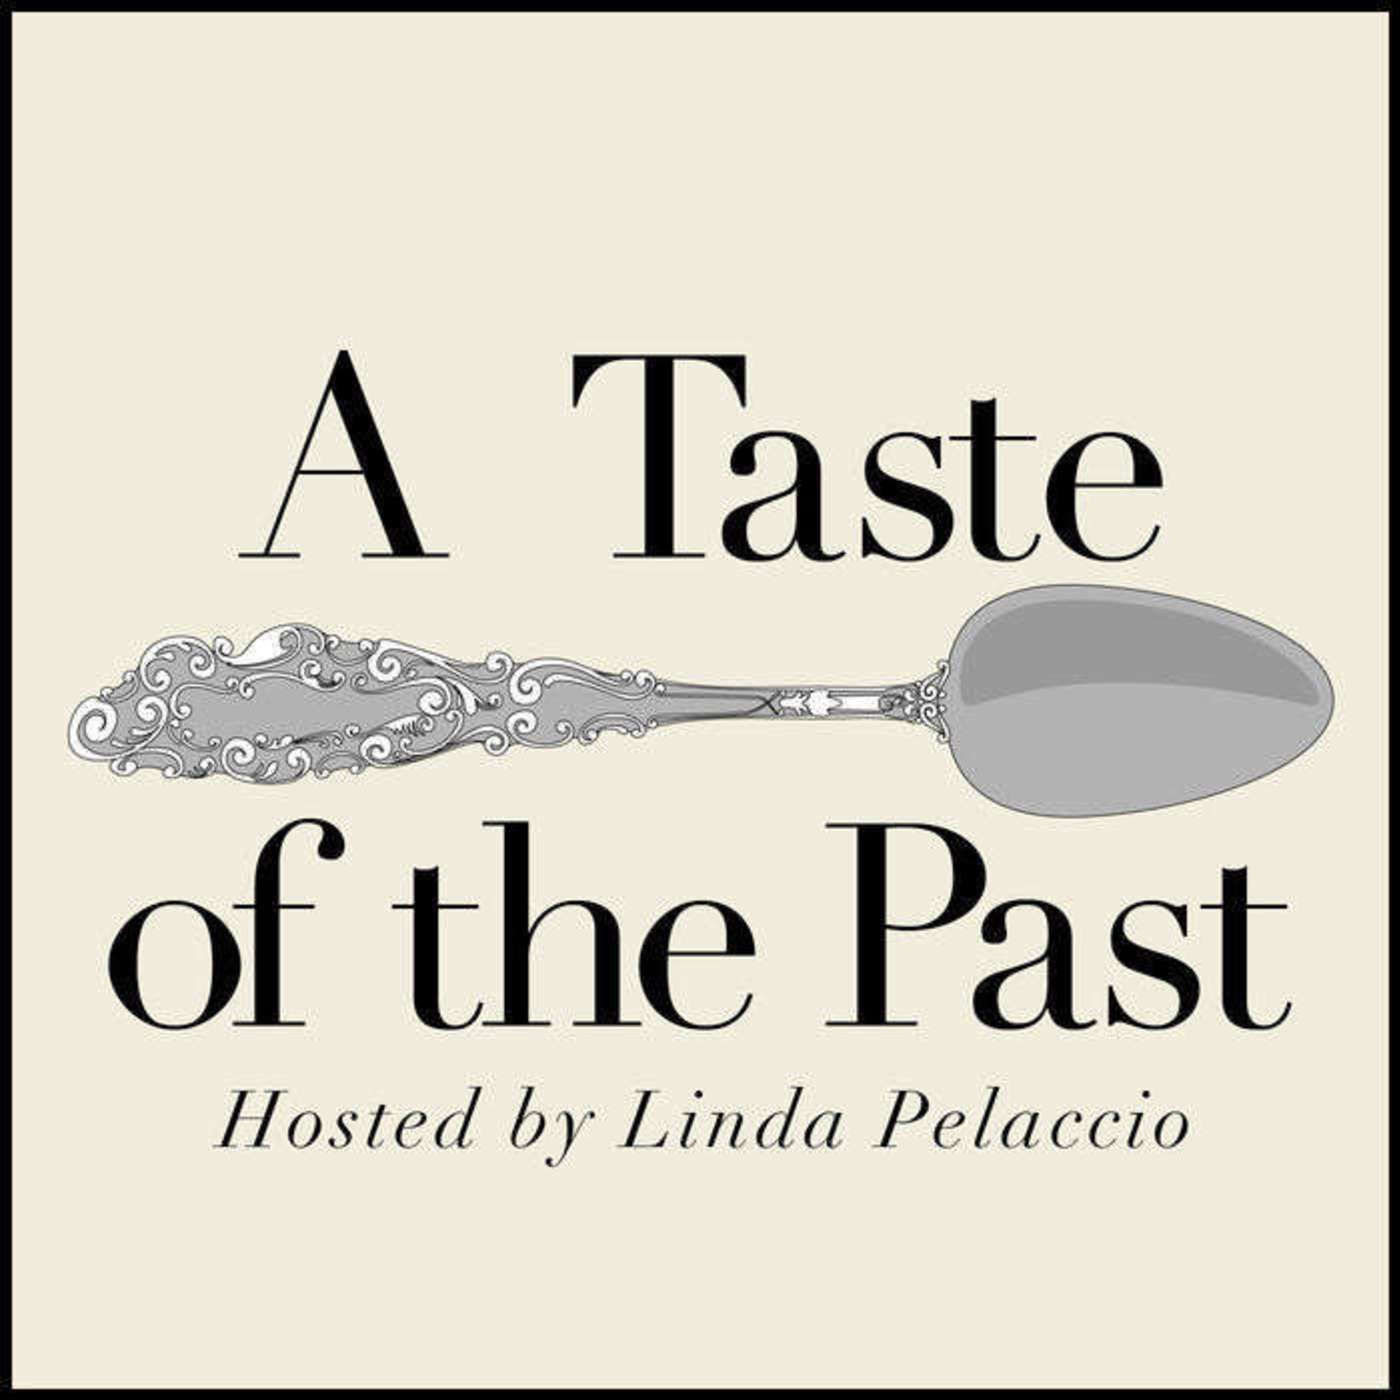 Episode 176: Ramen: The Untold History